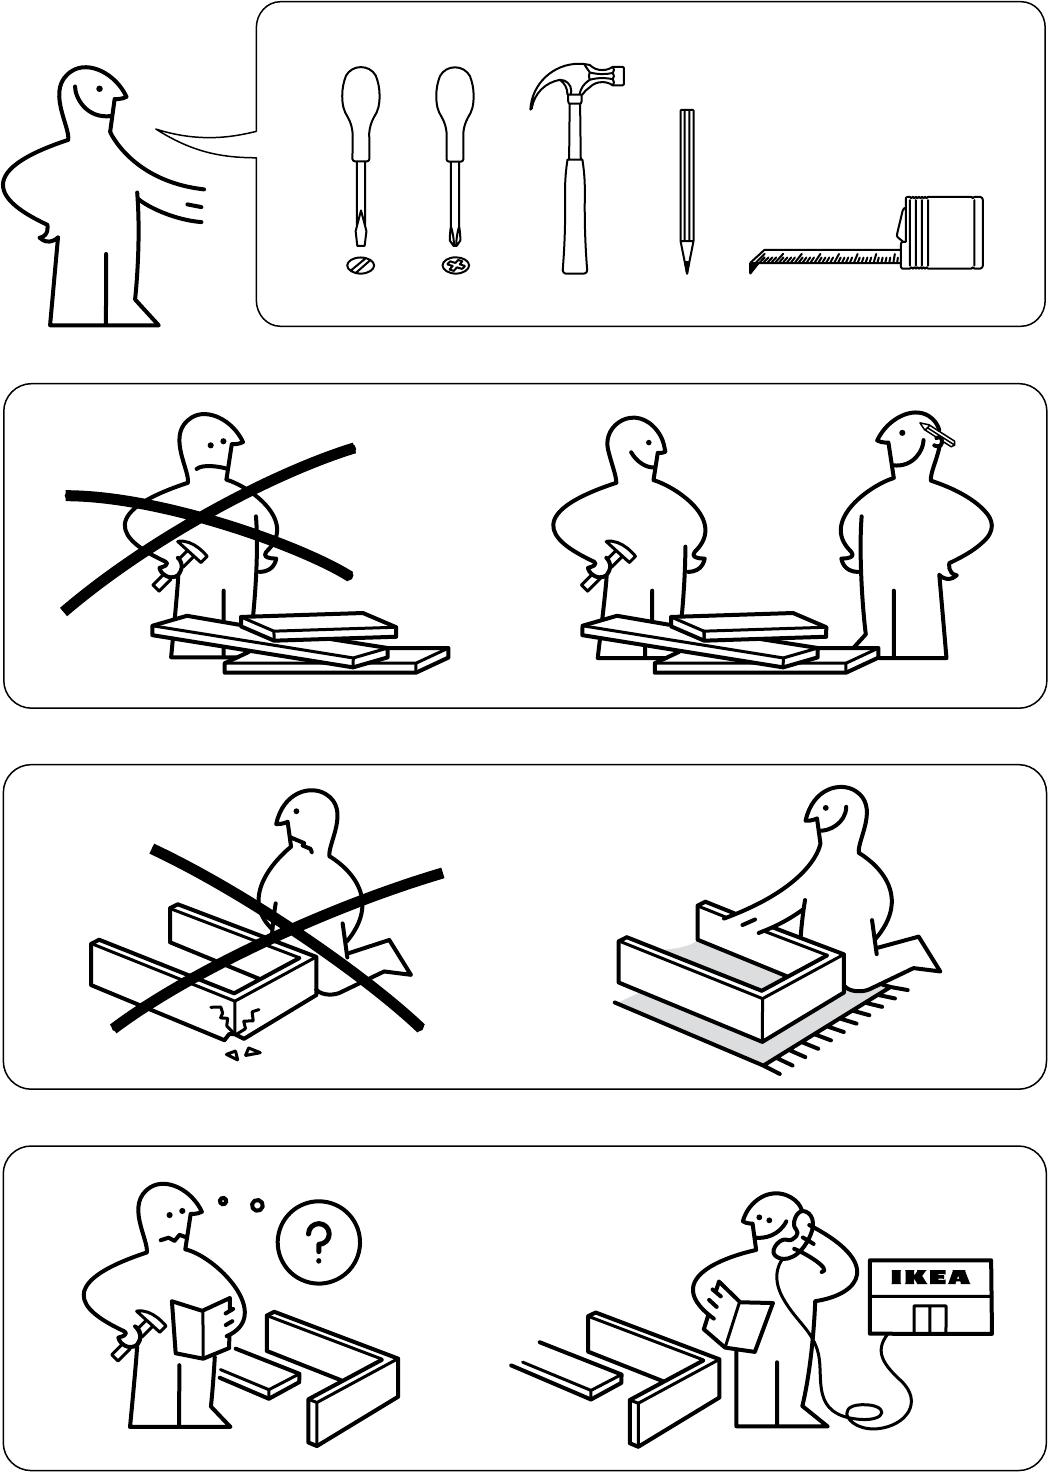 Hemnes Ladekast Met 8 Laden.Handleiding Ikea Hemnes Ladekast 8 Lades Pagina 1 Van 32 Dansk